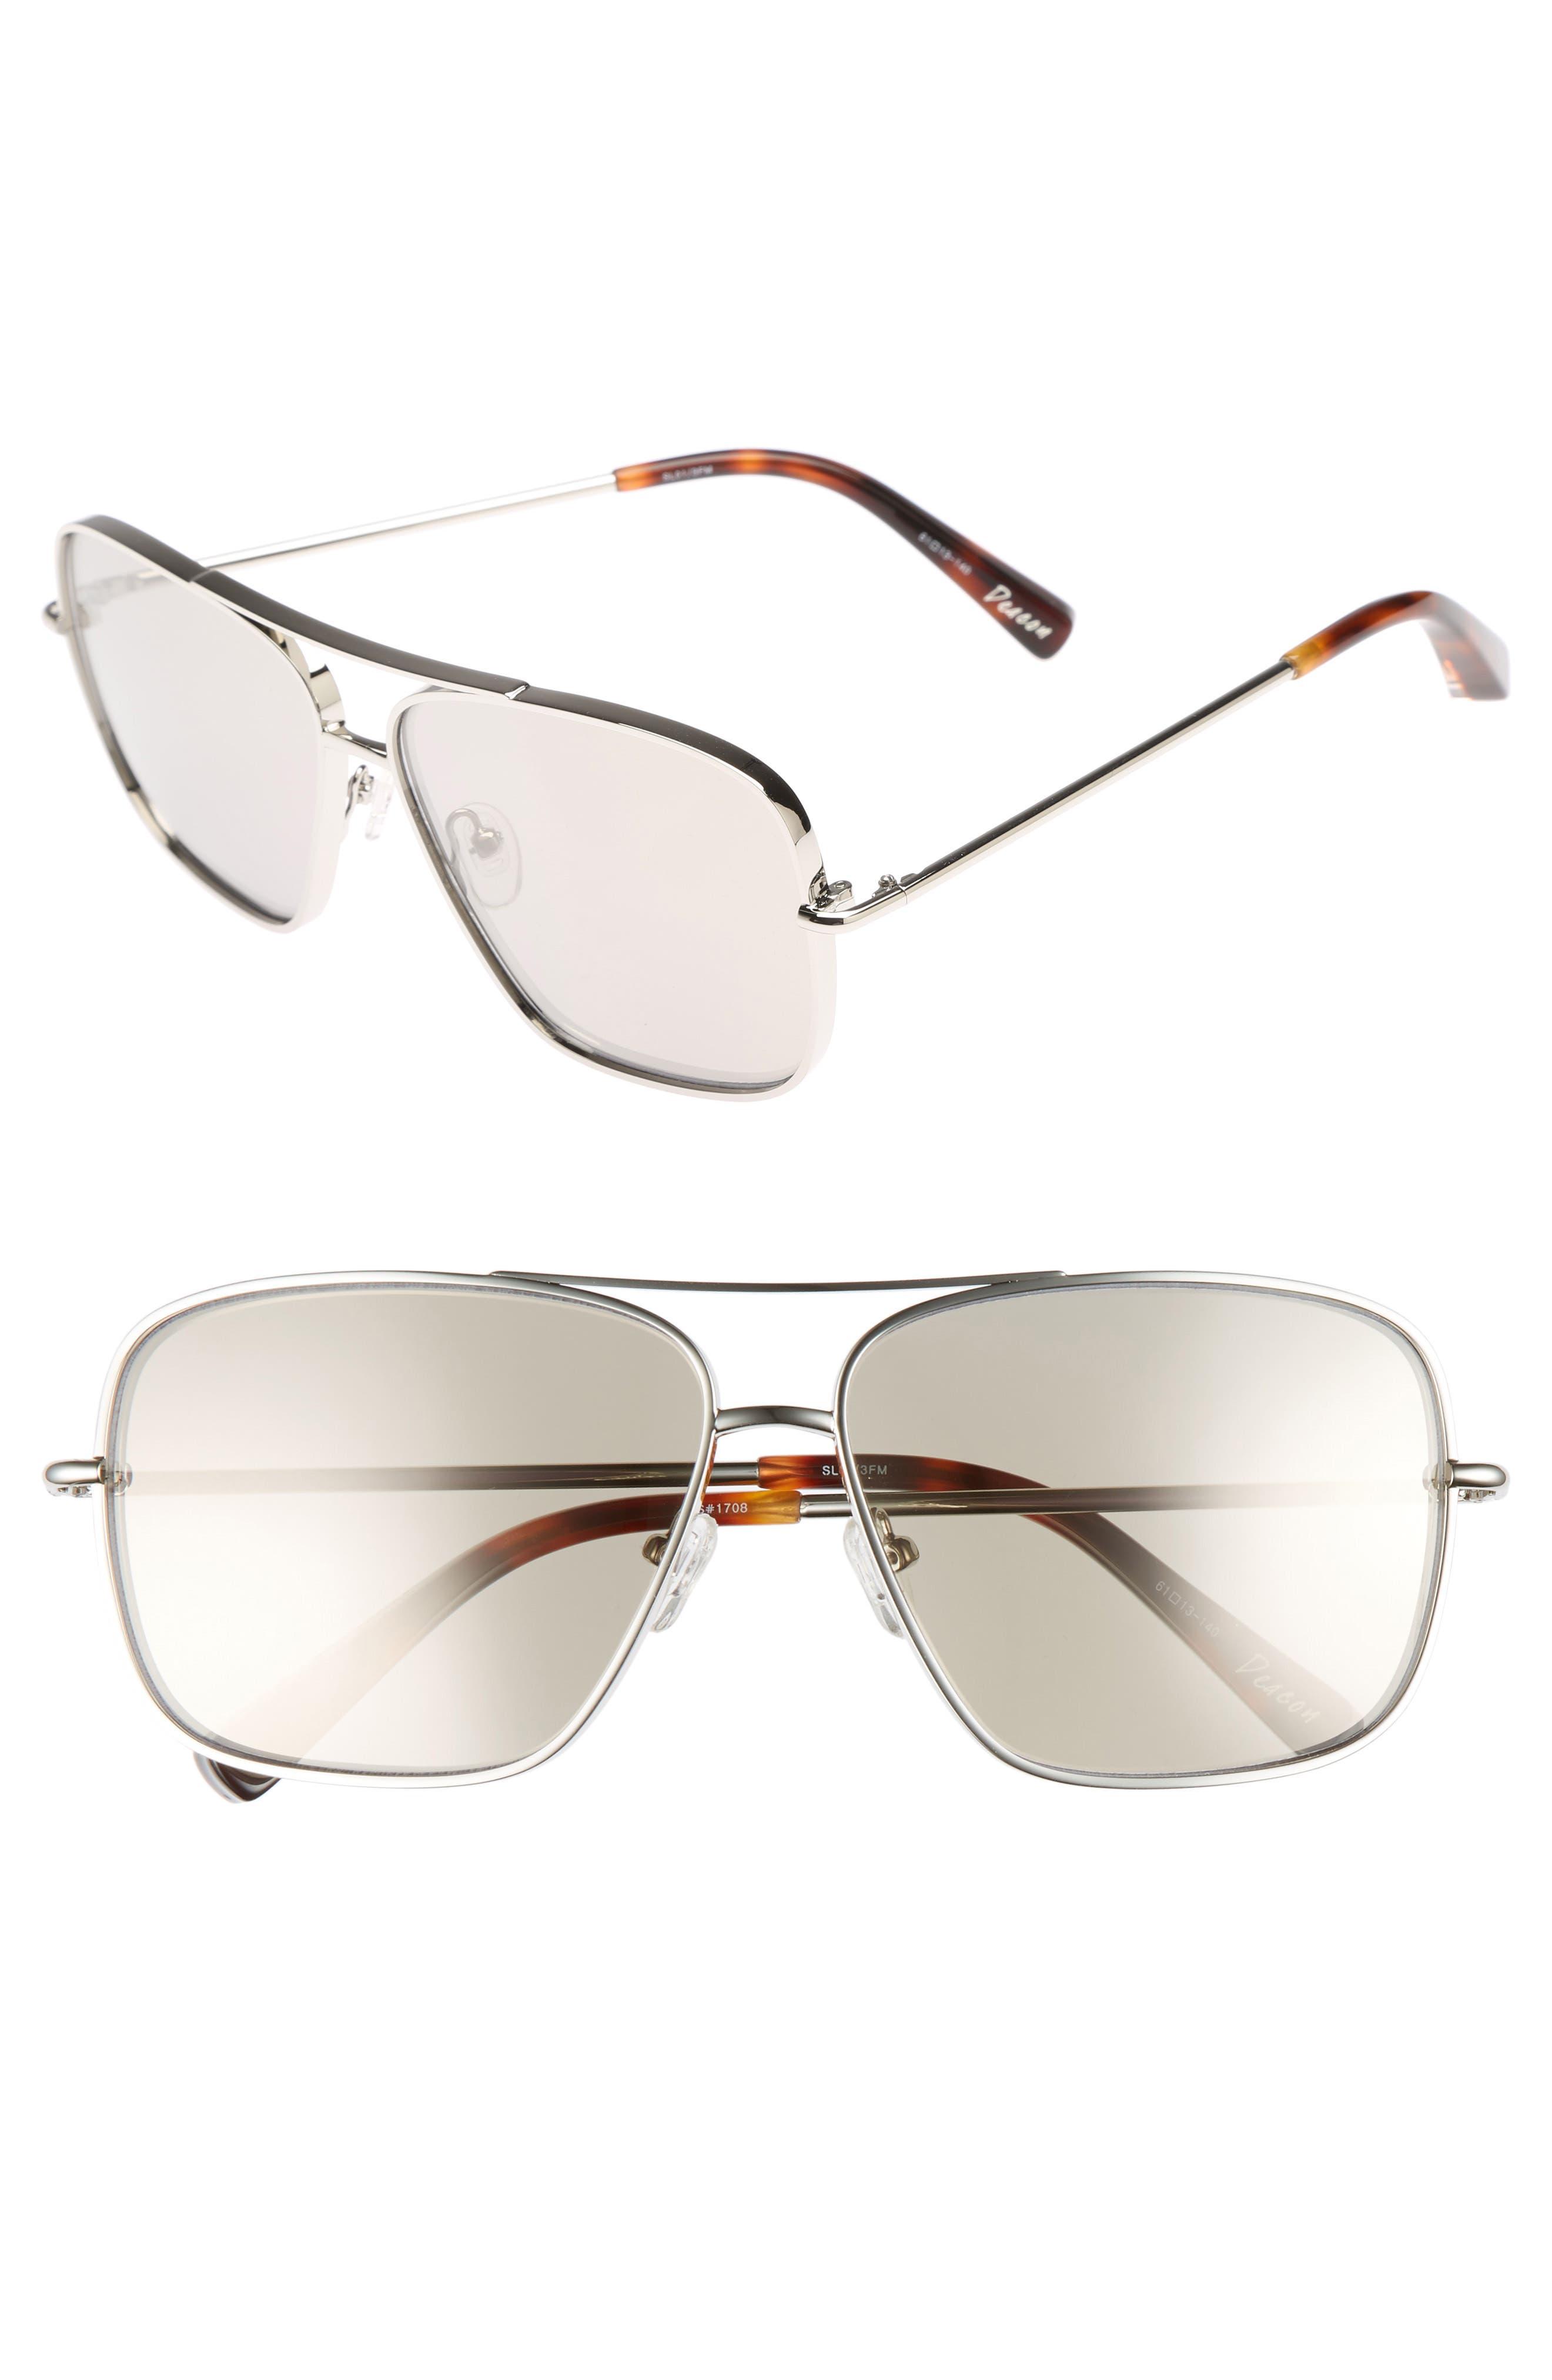 Deacon 61mm Aviator Sunglasses,                         Main,                         color, 040